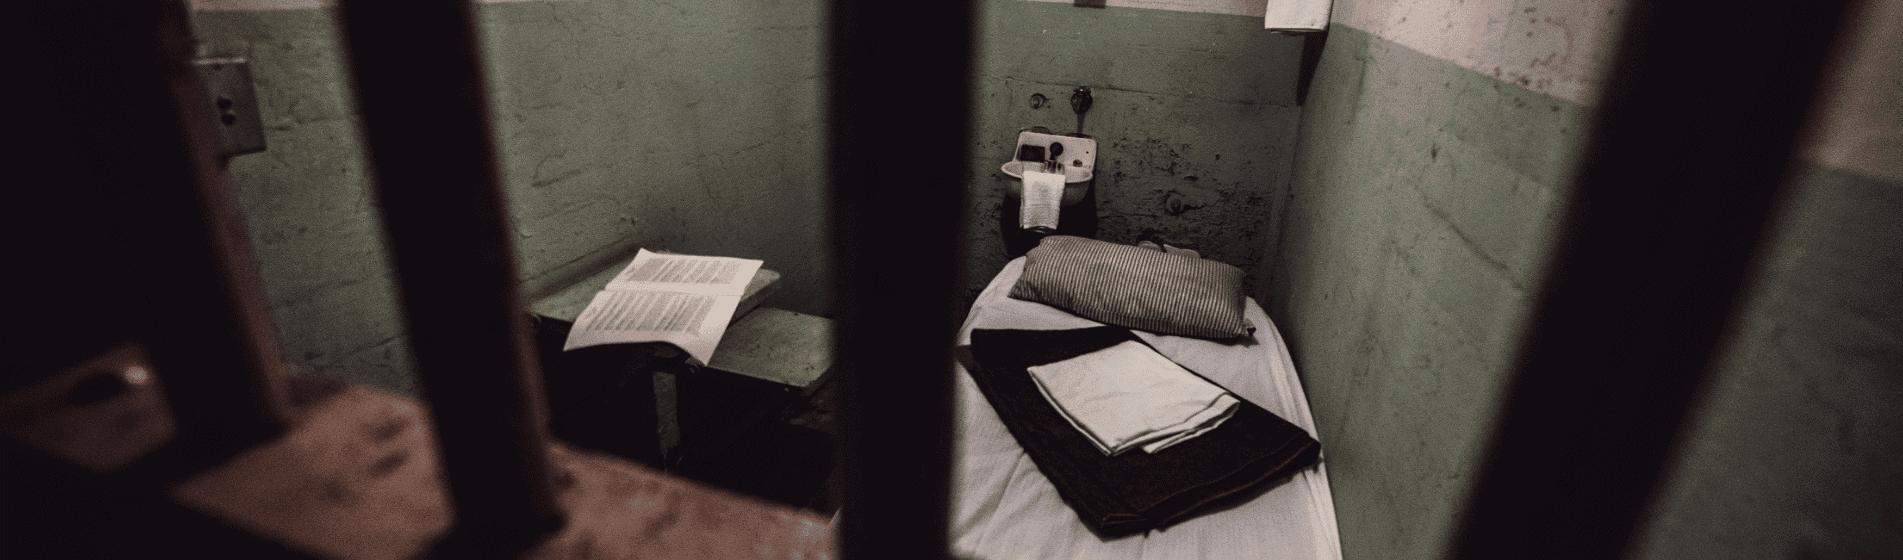 THE WORLD'S FIVE LARGEST PRISON POPULATIONS PER CAPITA